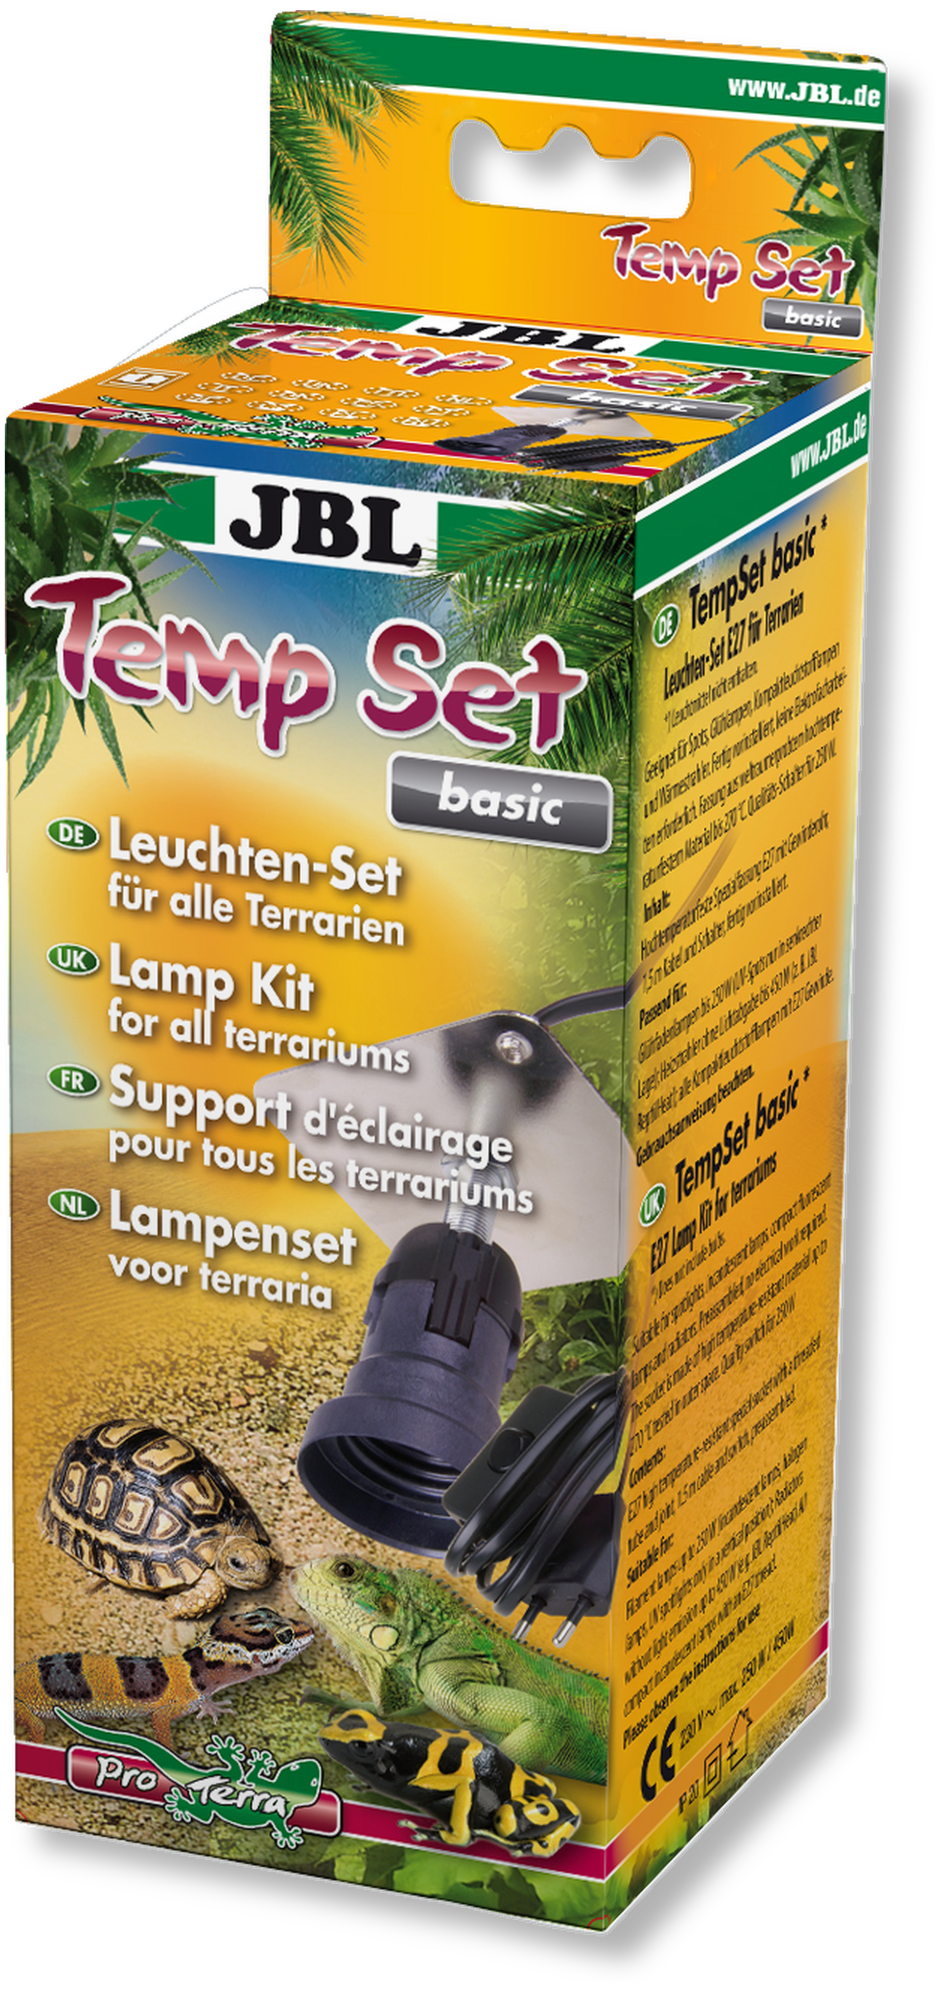 JBL TempSet basic